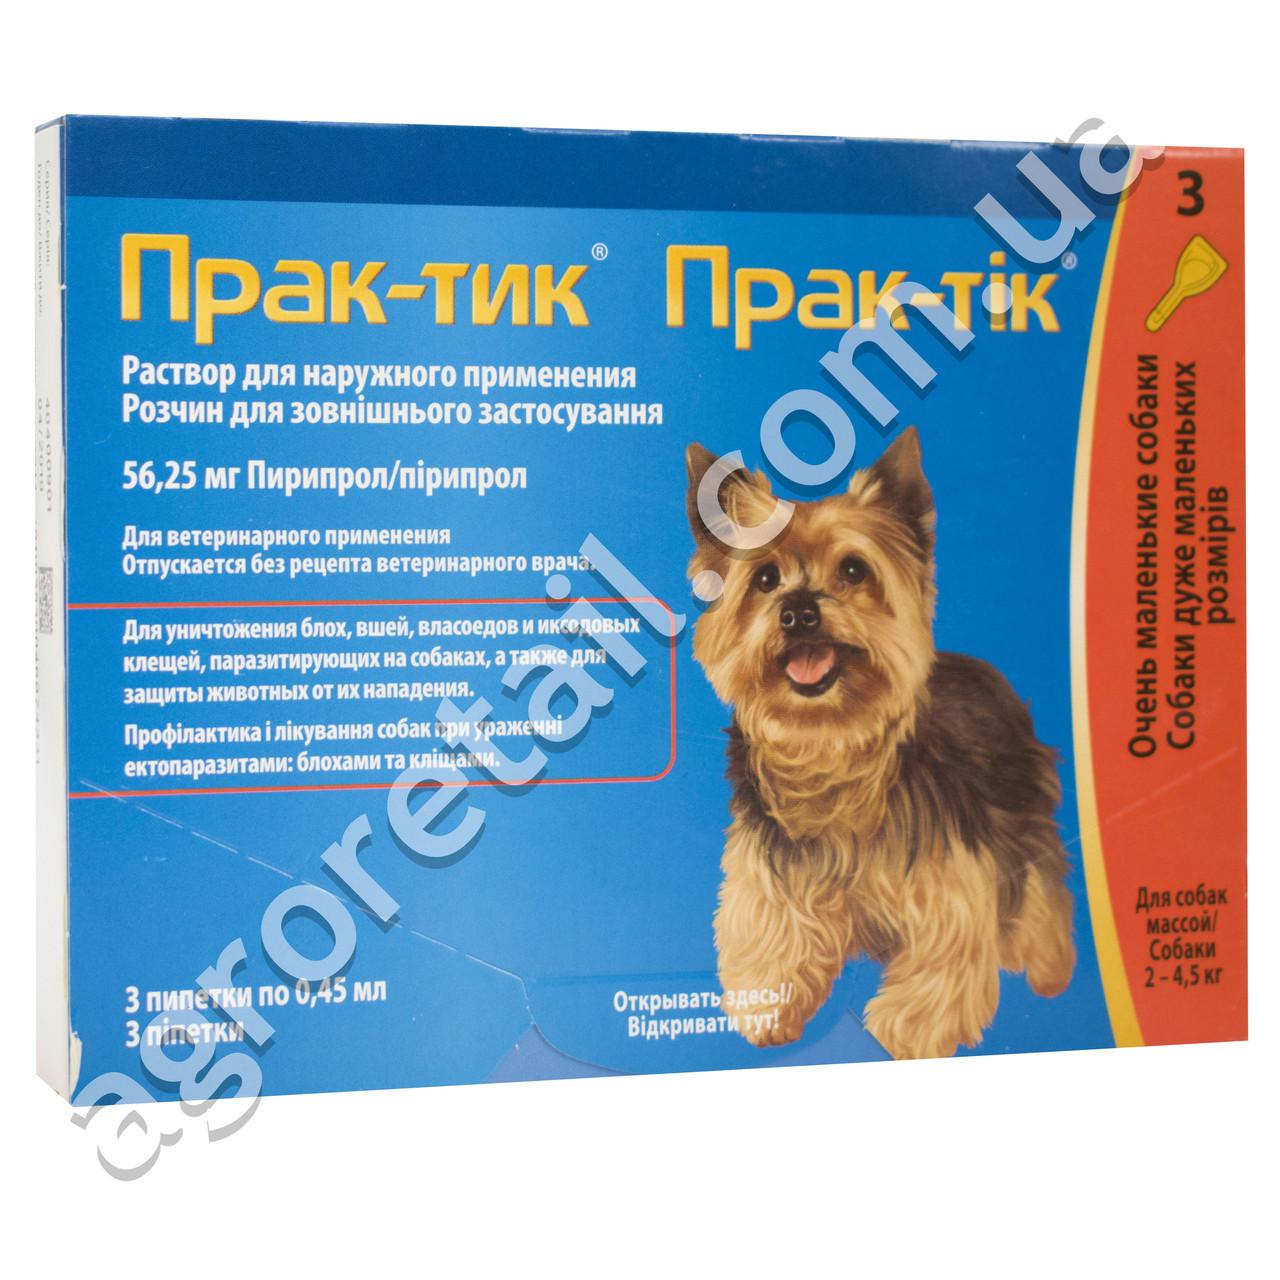 Прак-тик капли для собак от 2 до 4.5 кг 3 пипетки по 0.45 мл